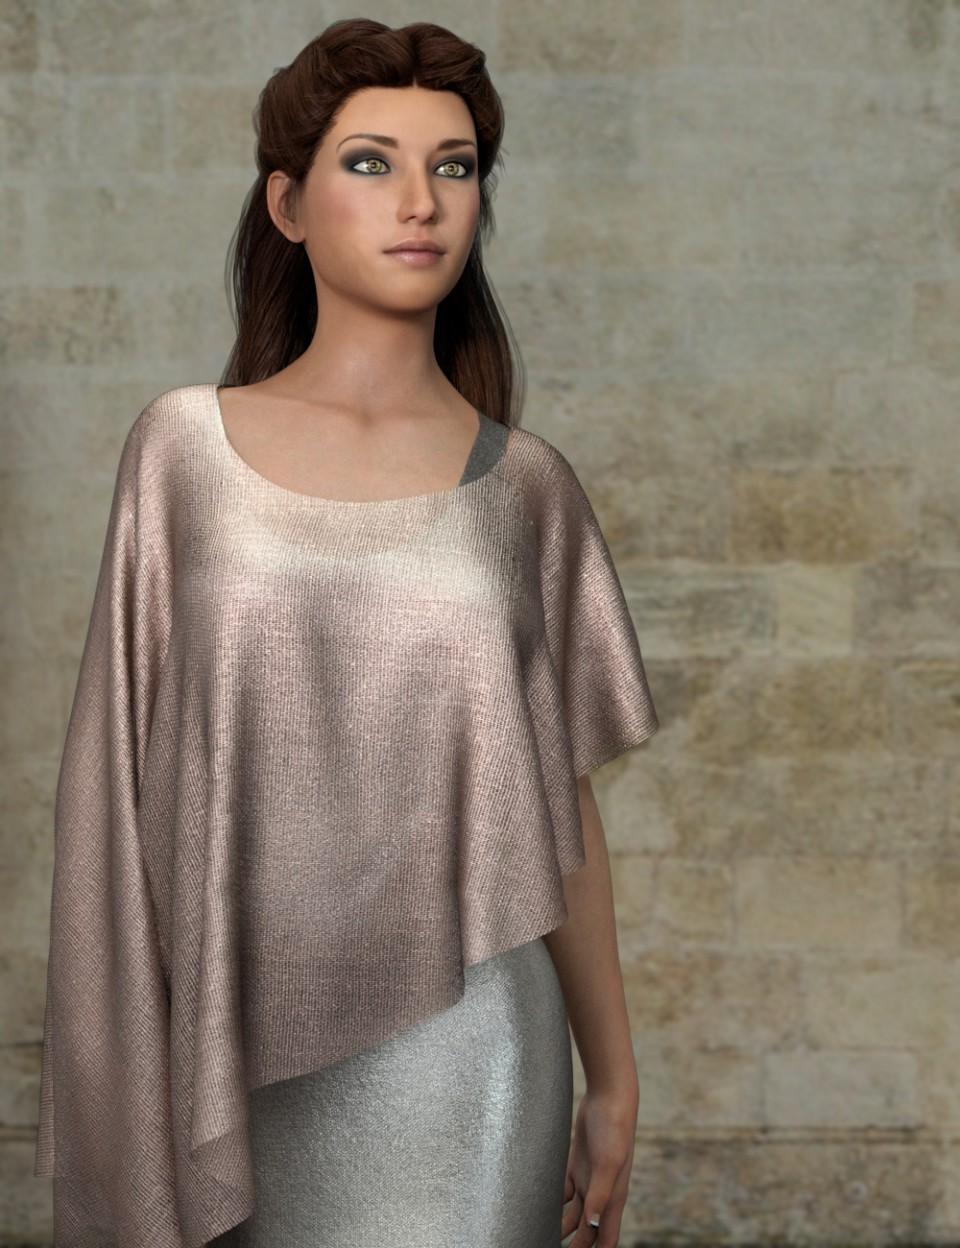 Sheer Metalic Fabrics for Iray